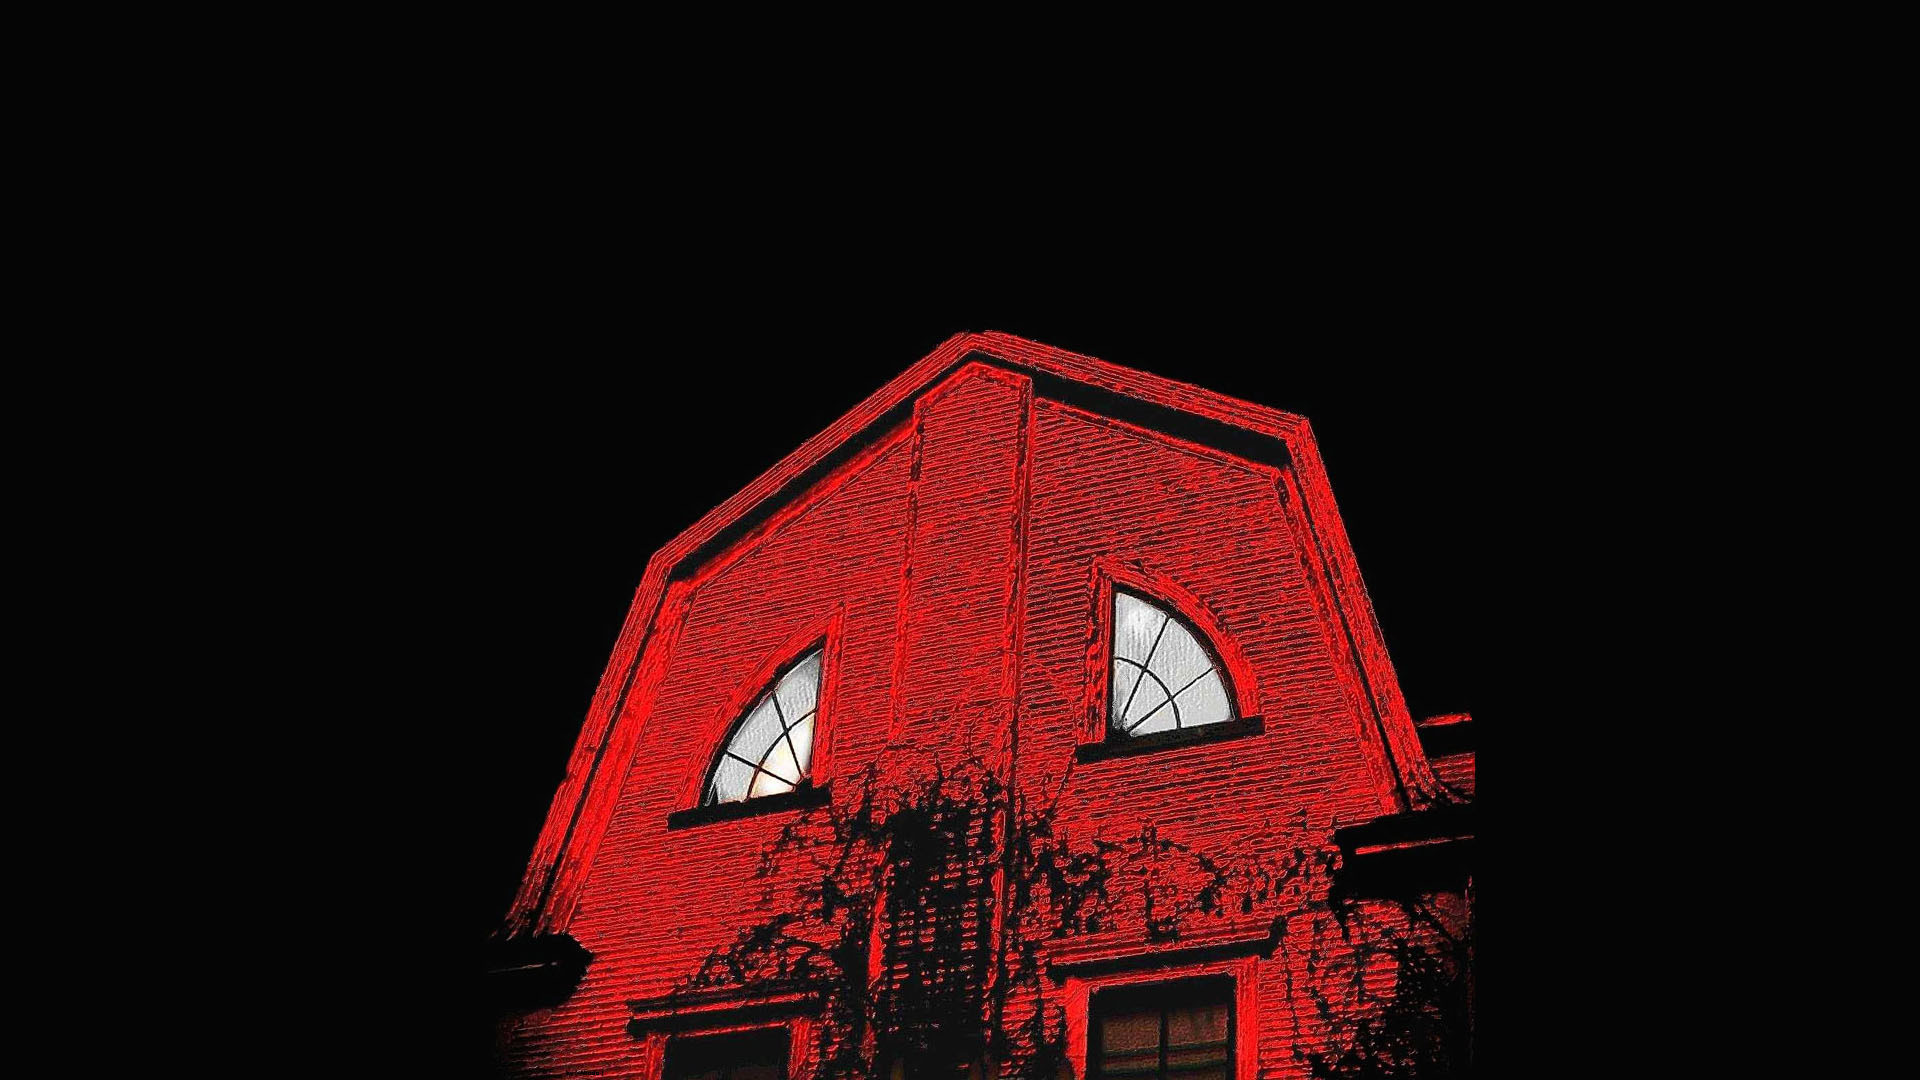 The amityville horror movie fanart for Amityville la maison du diable film